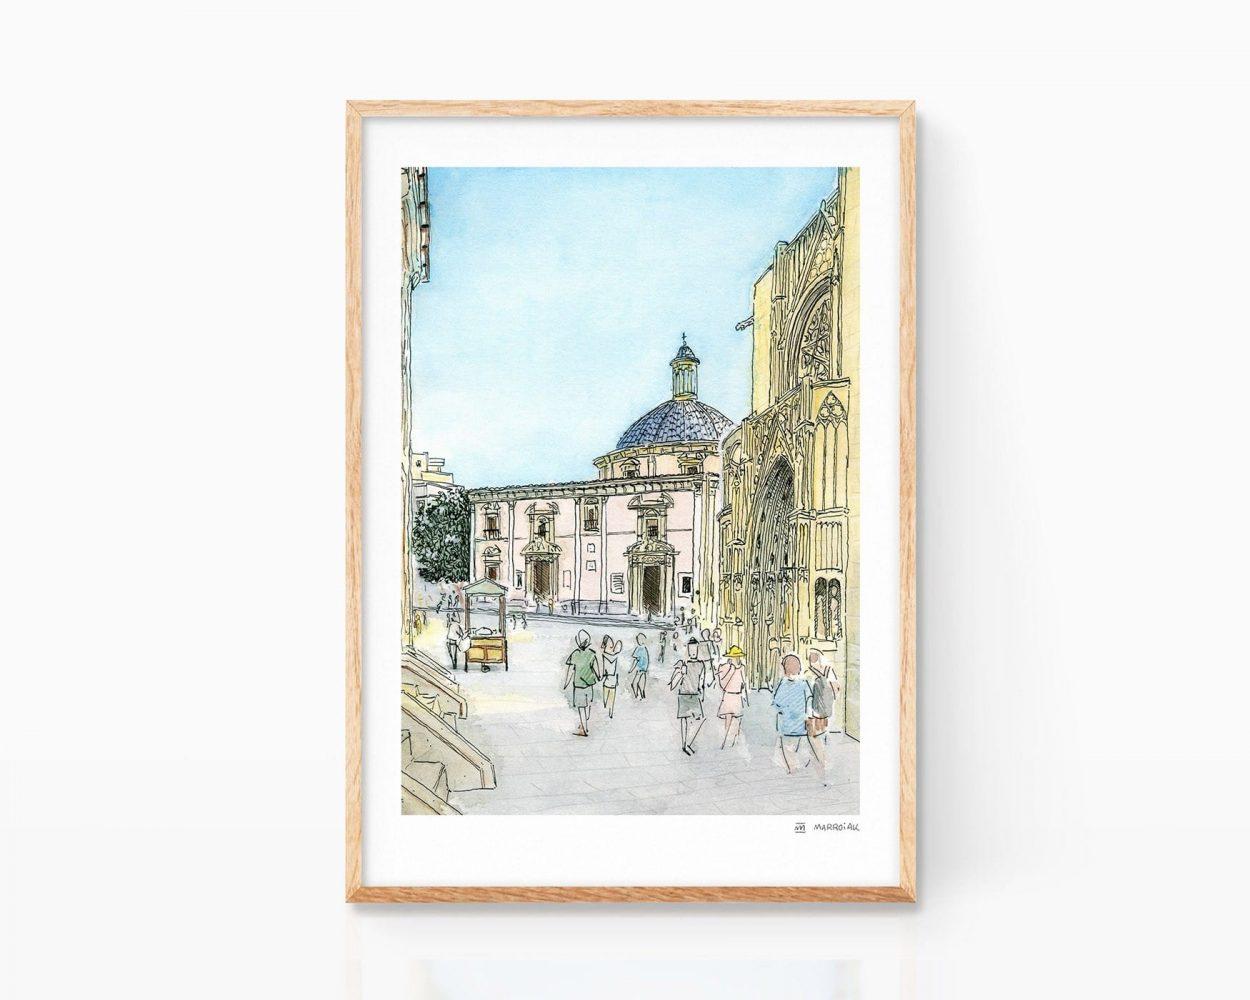 Print sheet with an illustration of the Plaza de la Virgen in the Carmen neighborhood of Valencia. Valencian drawings. online sale